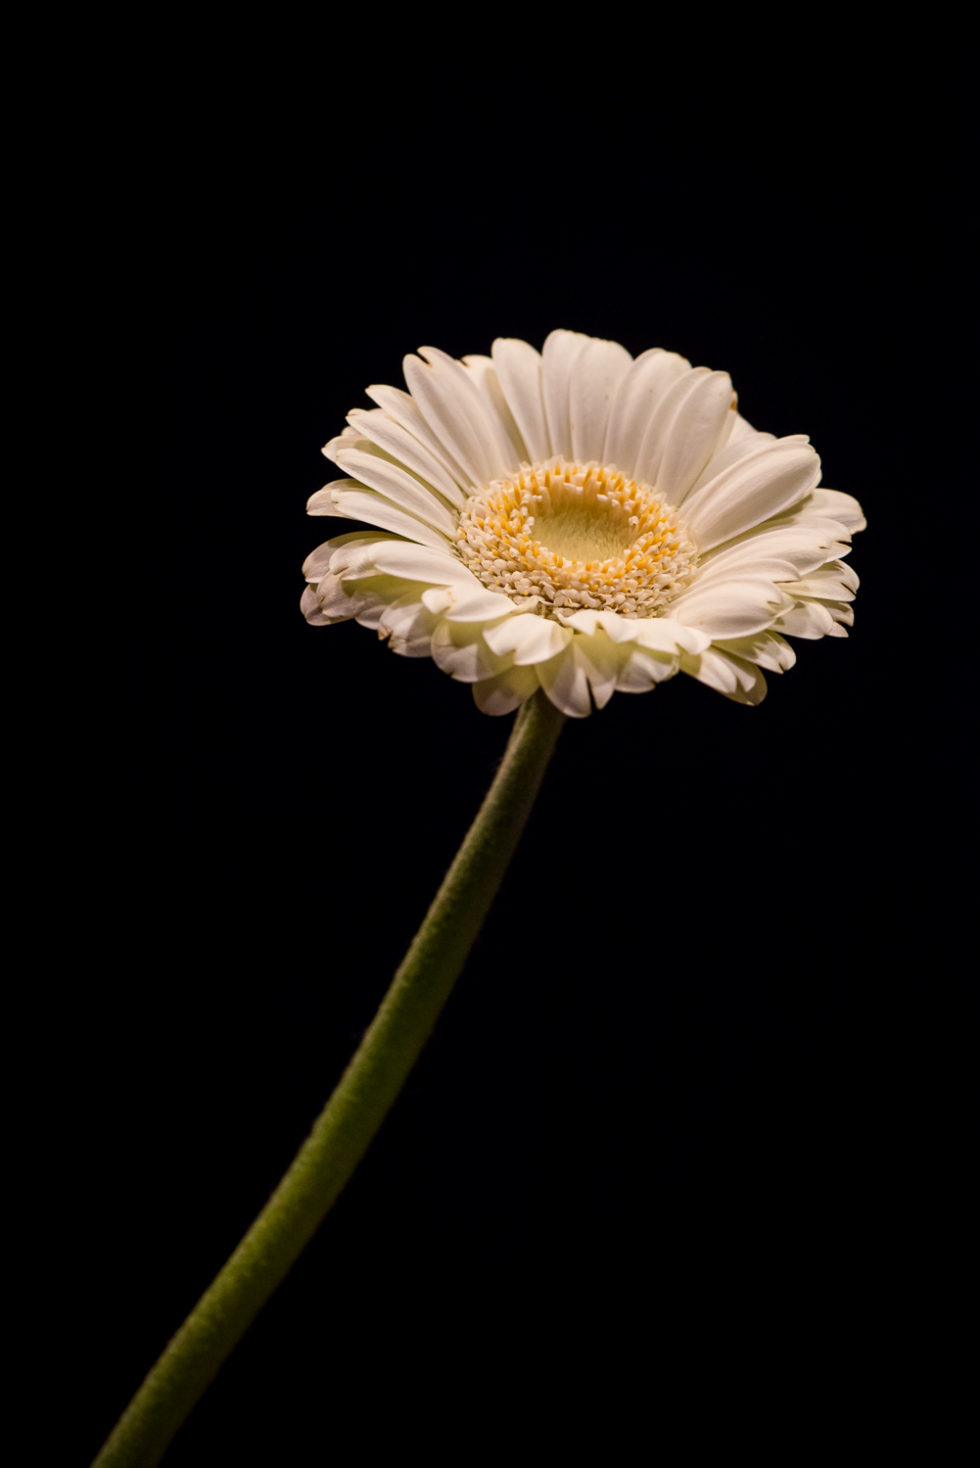 186/365v3 Just a Flower